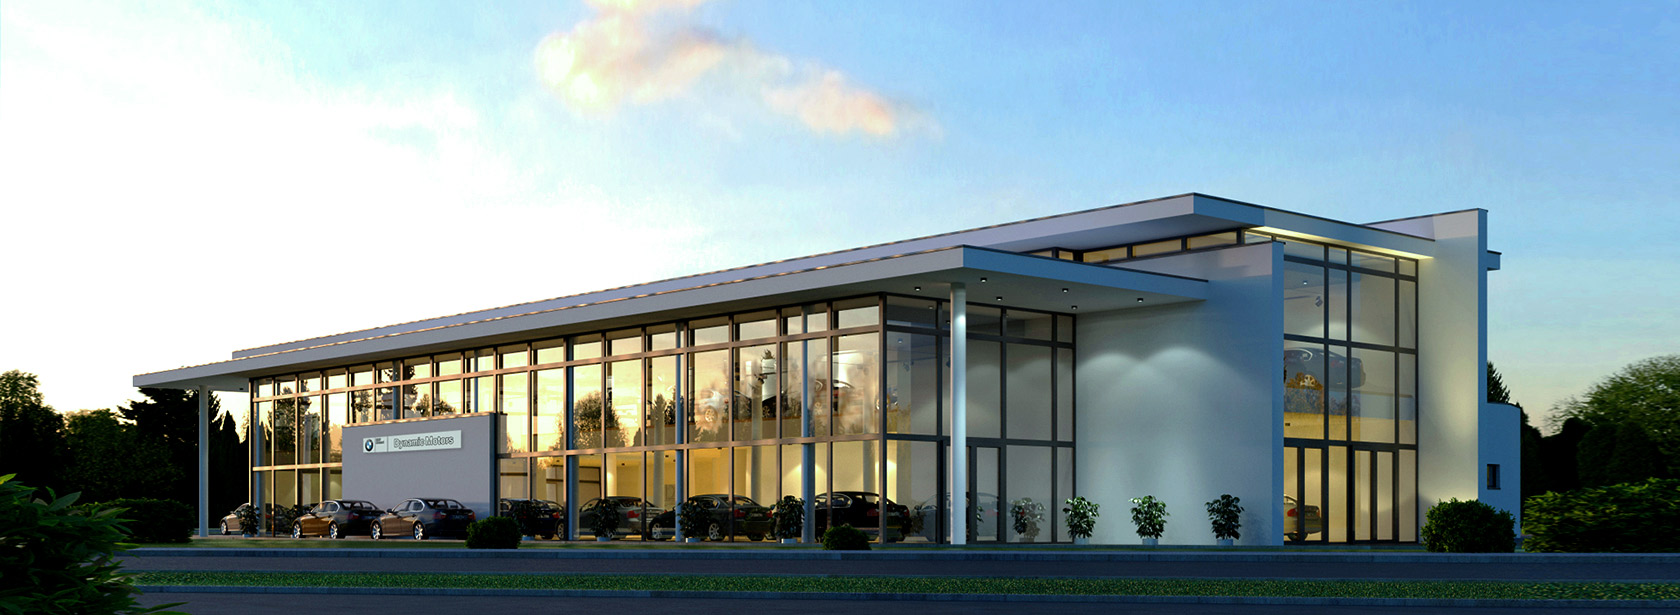 Salon Dealer BMW Dynamic Motors Bydgoszcz.